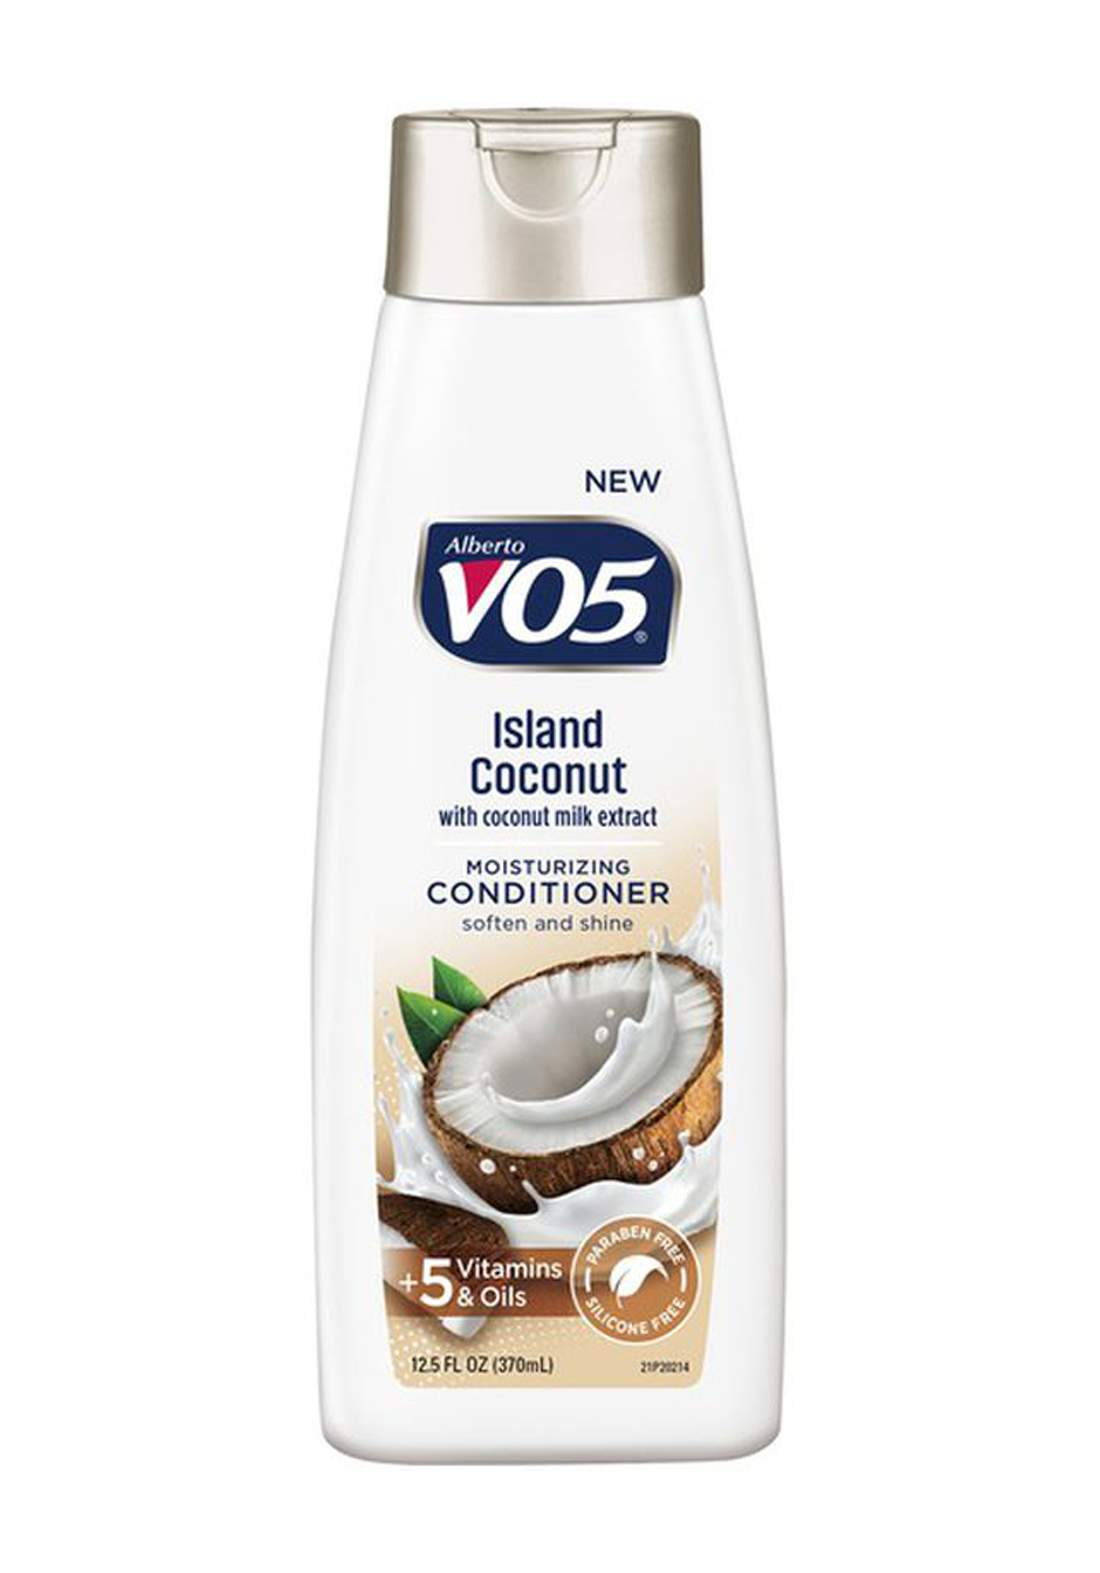 VO5 Moisture Milks Conditioner Island Coconut  370ml بلسم للشعر